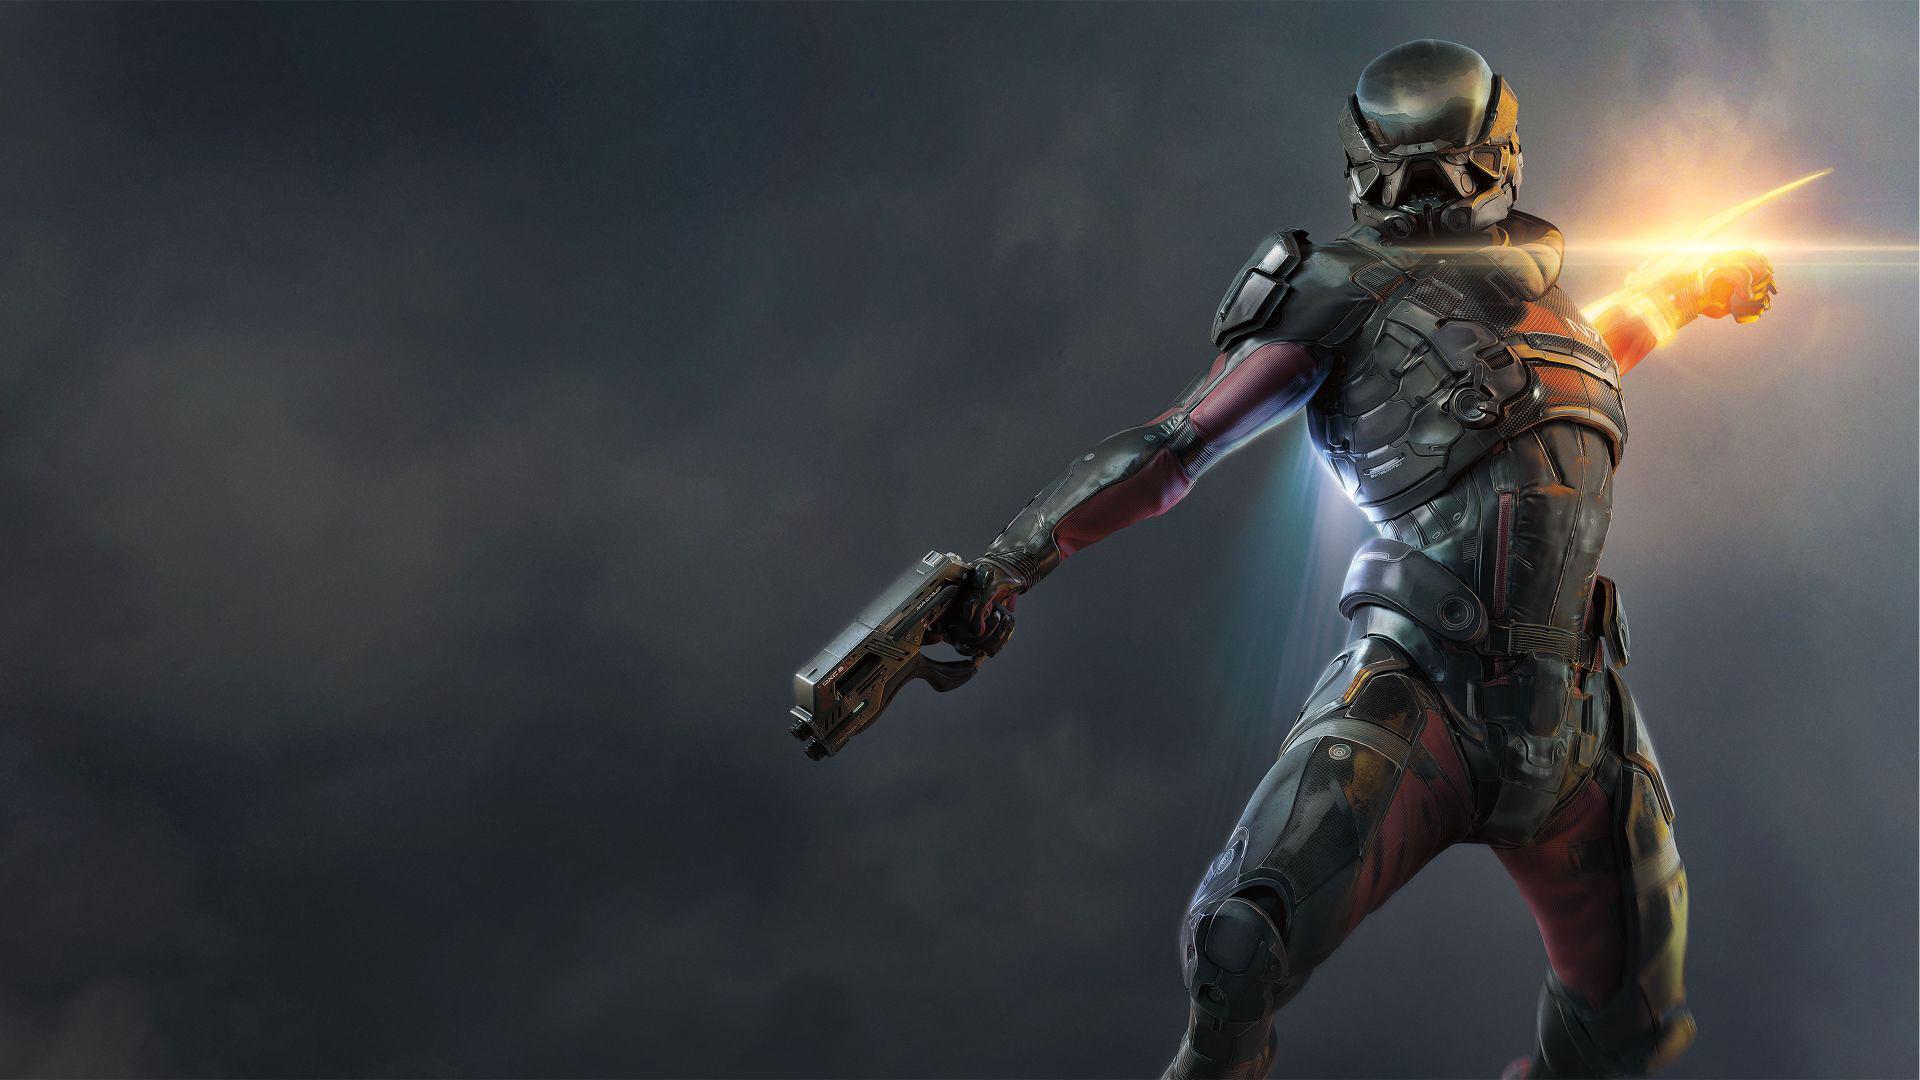 358940233.jpg - Mass Effect: Andromeda